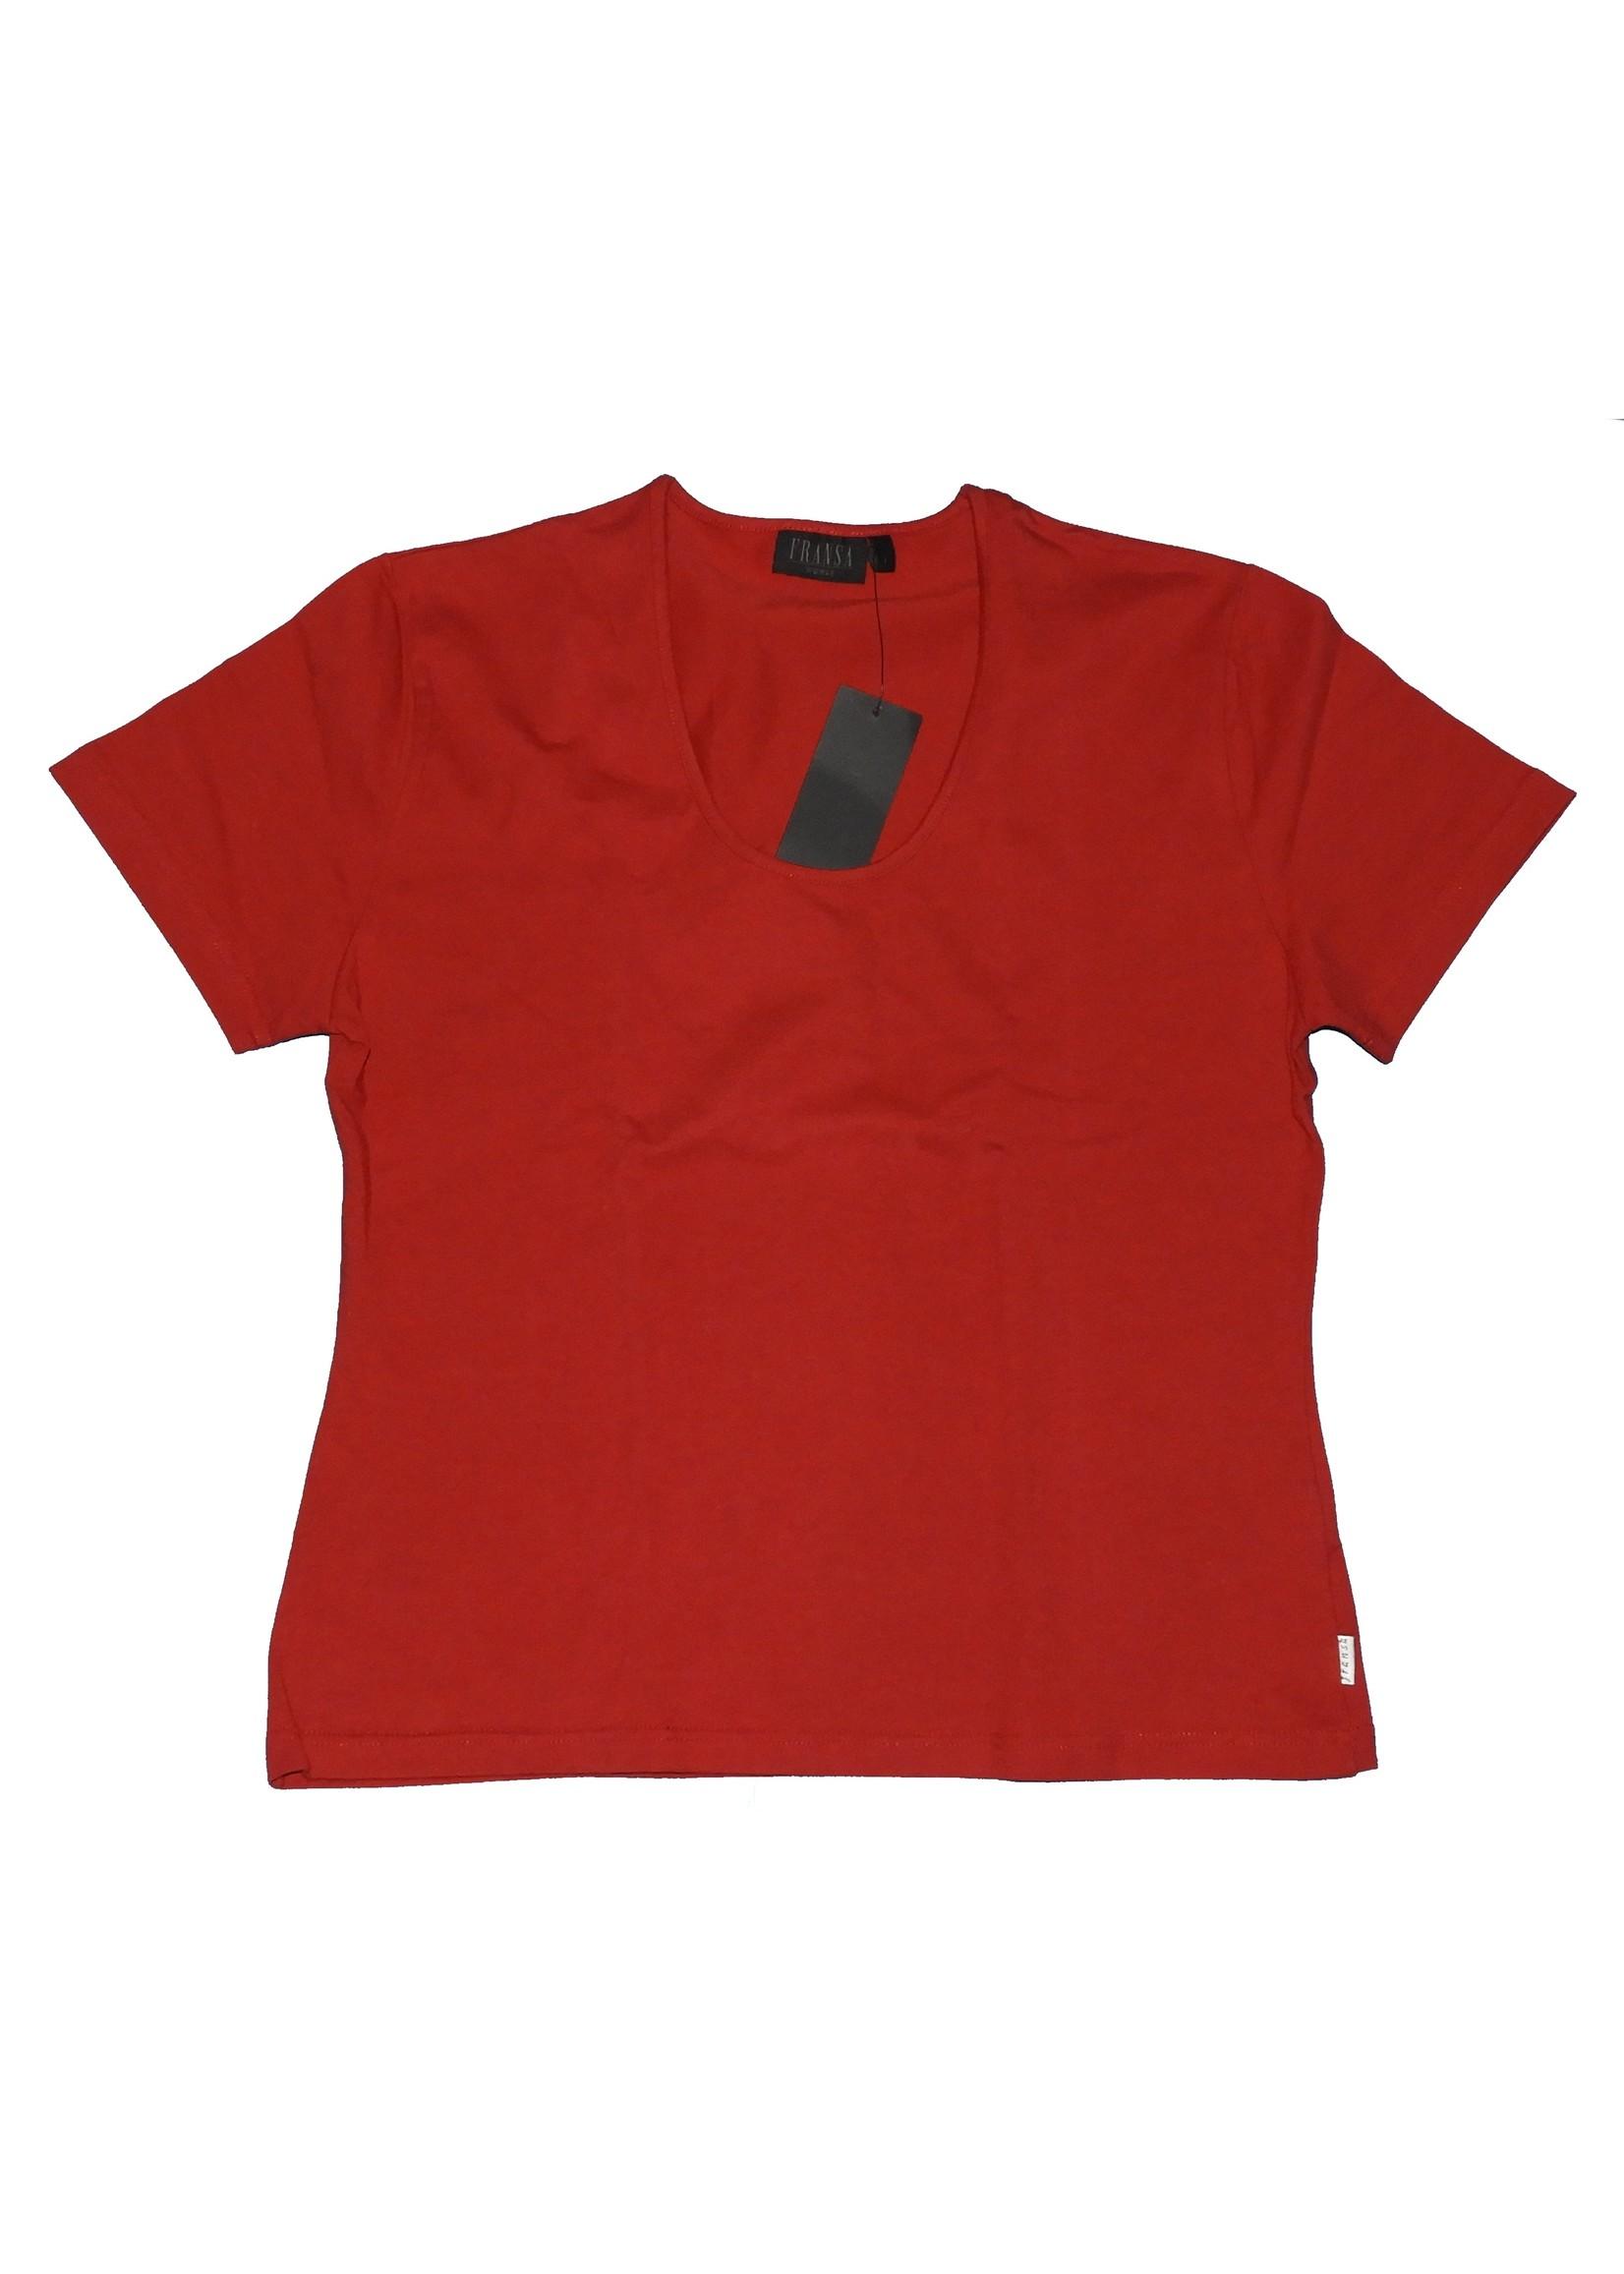 Fransa T-shirt maat S + L